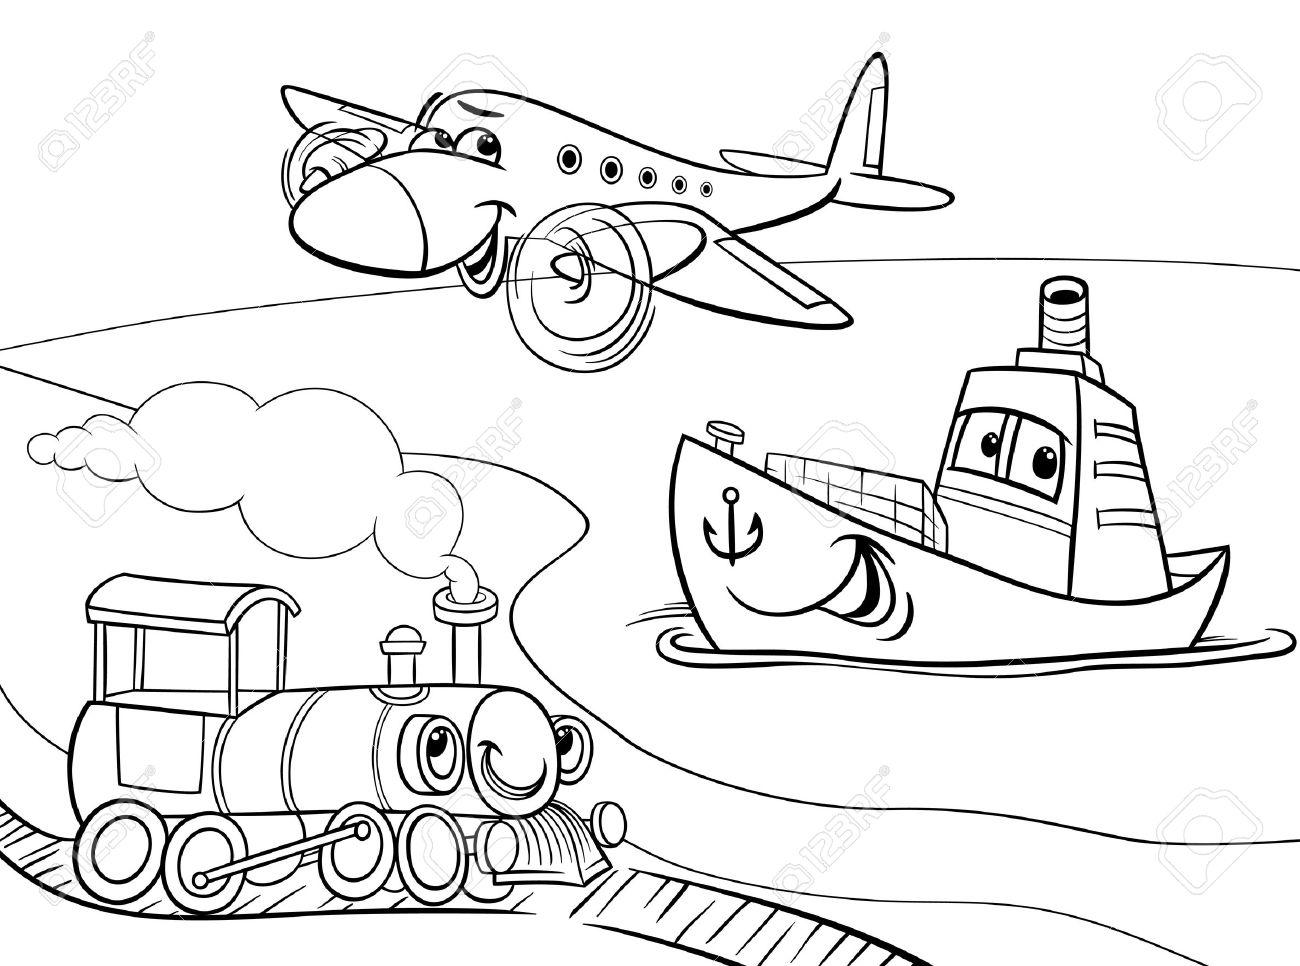 air transportation coloring pages eliolera - Air Transportation Coloring Pages